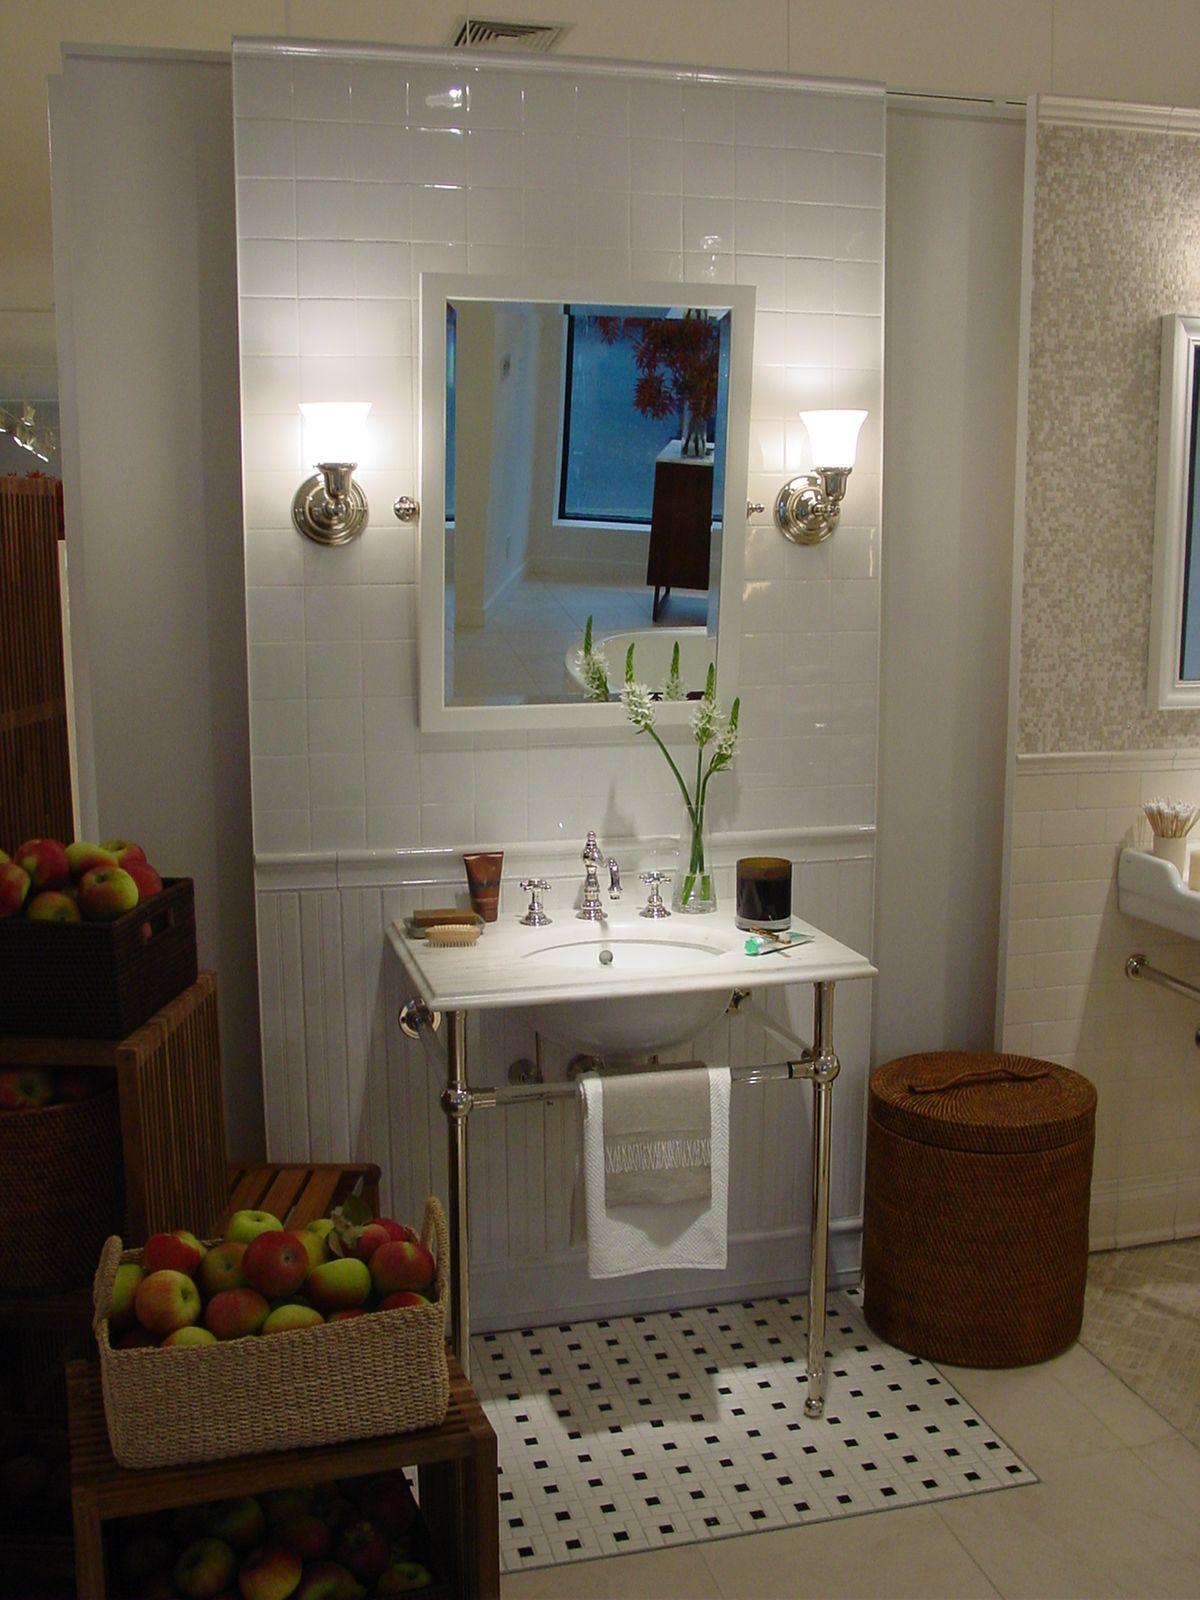 Bathroom showrooms canberra - Bath Display In The Greenwich Showroom Greenwich Showroom Pinterest Waterworks Showroom And Display